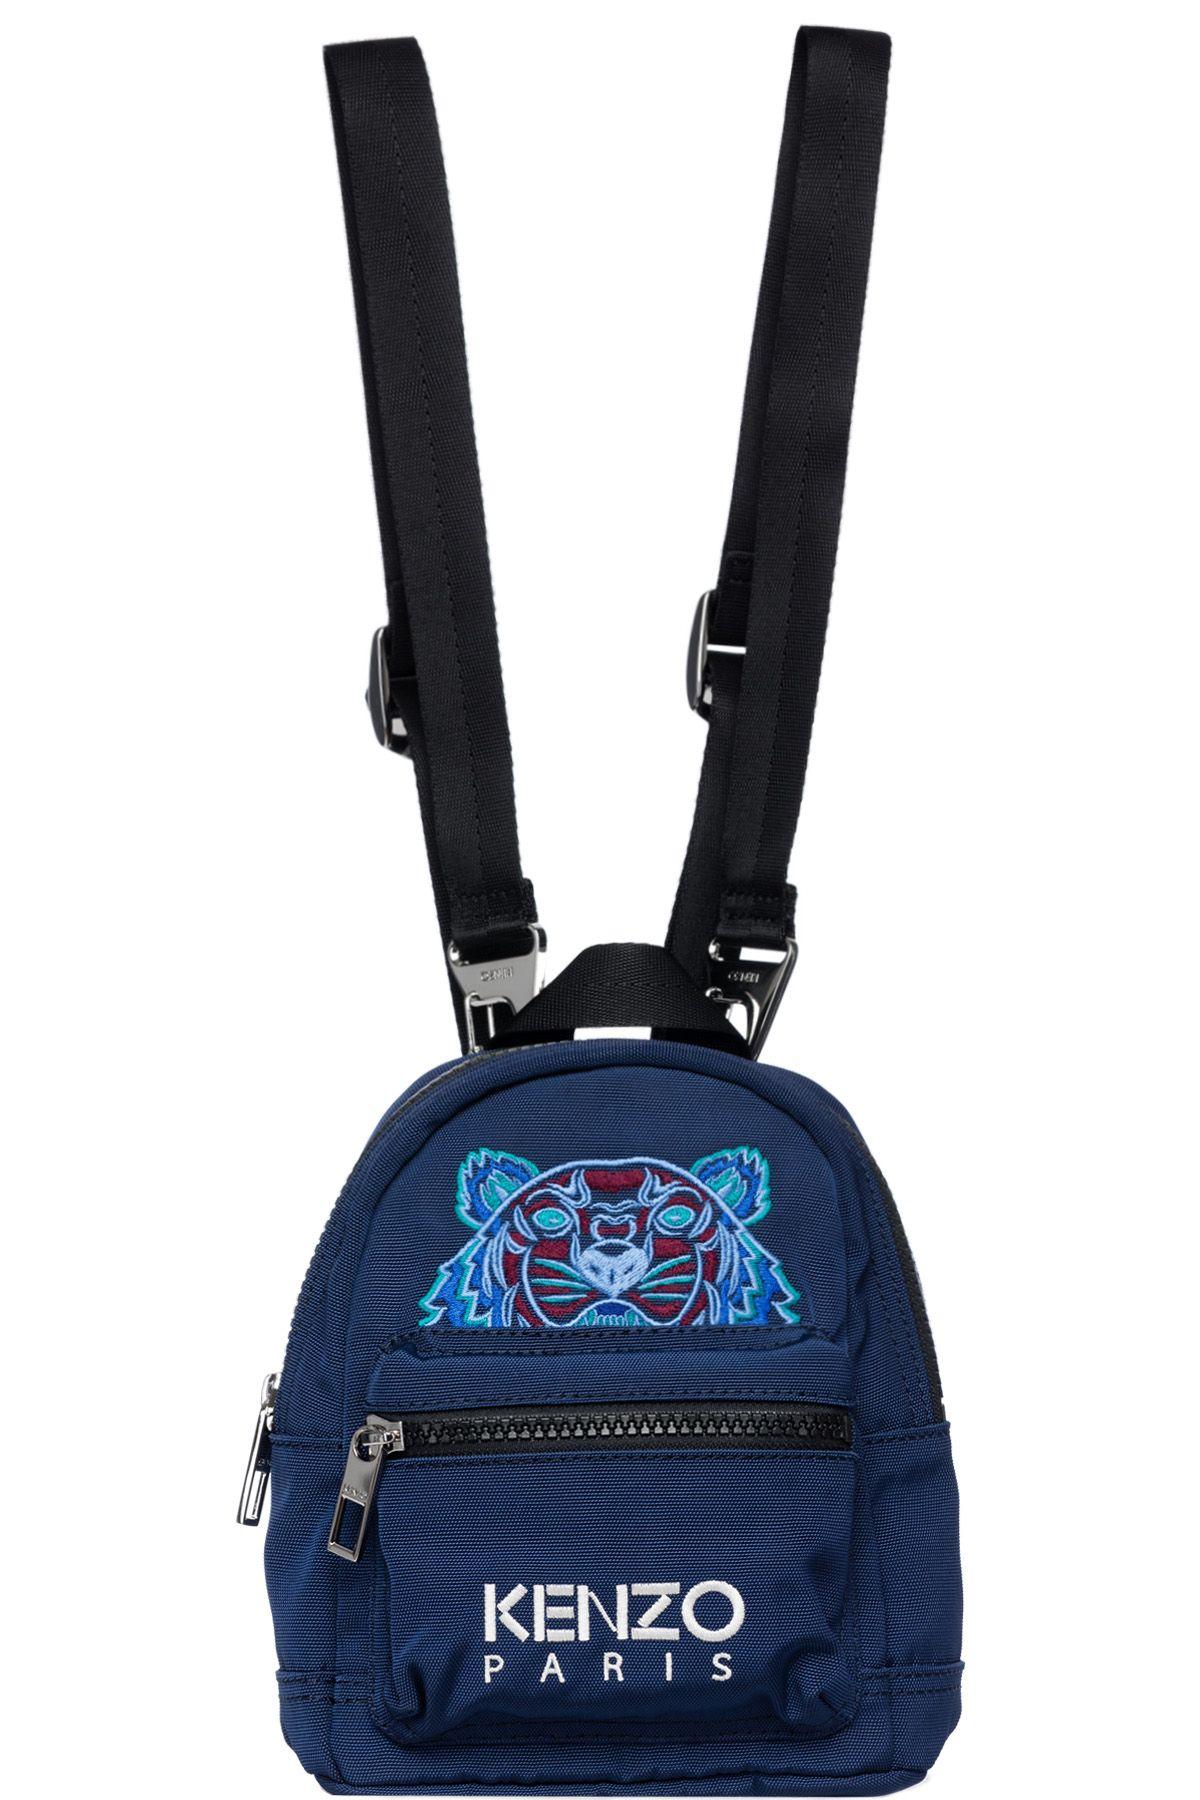 20fce007 Canvas Backpack, Sling Backpack, Leopard Spots, Print Logo, Metal Buckles,  Zipper